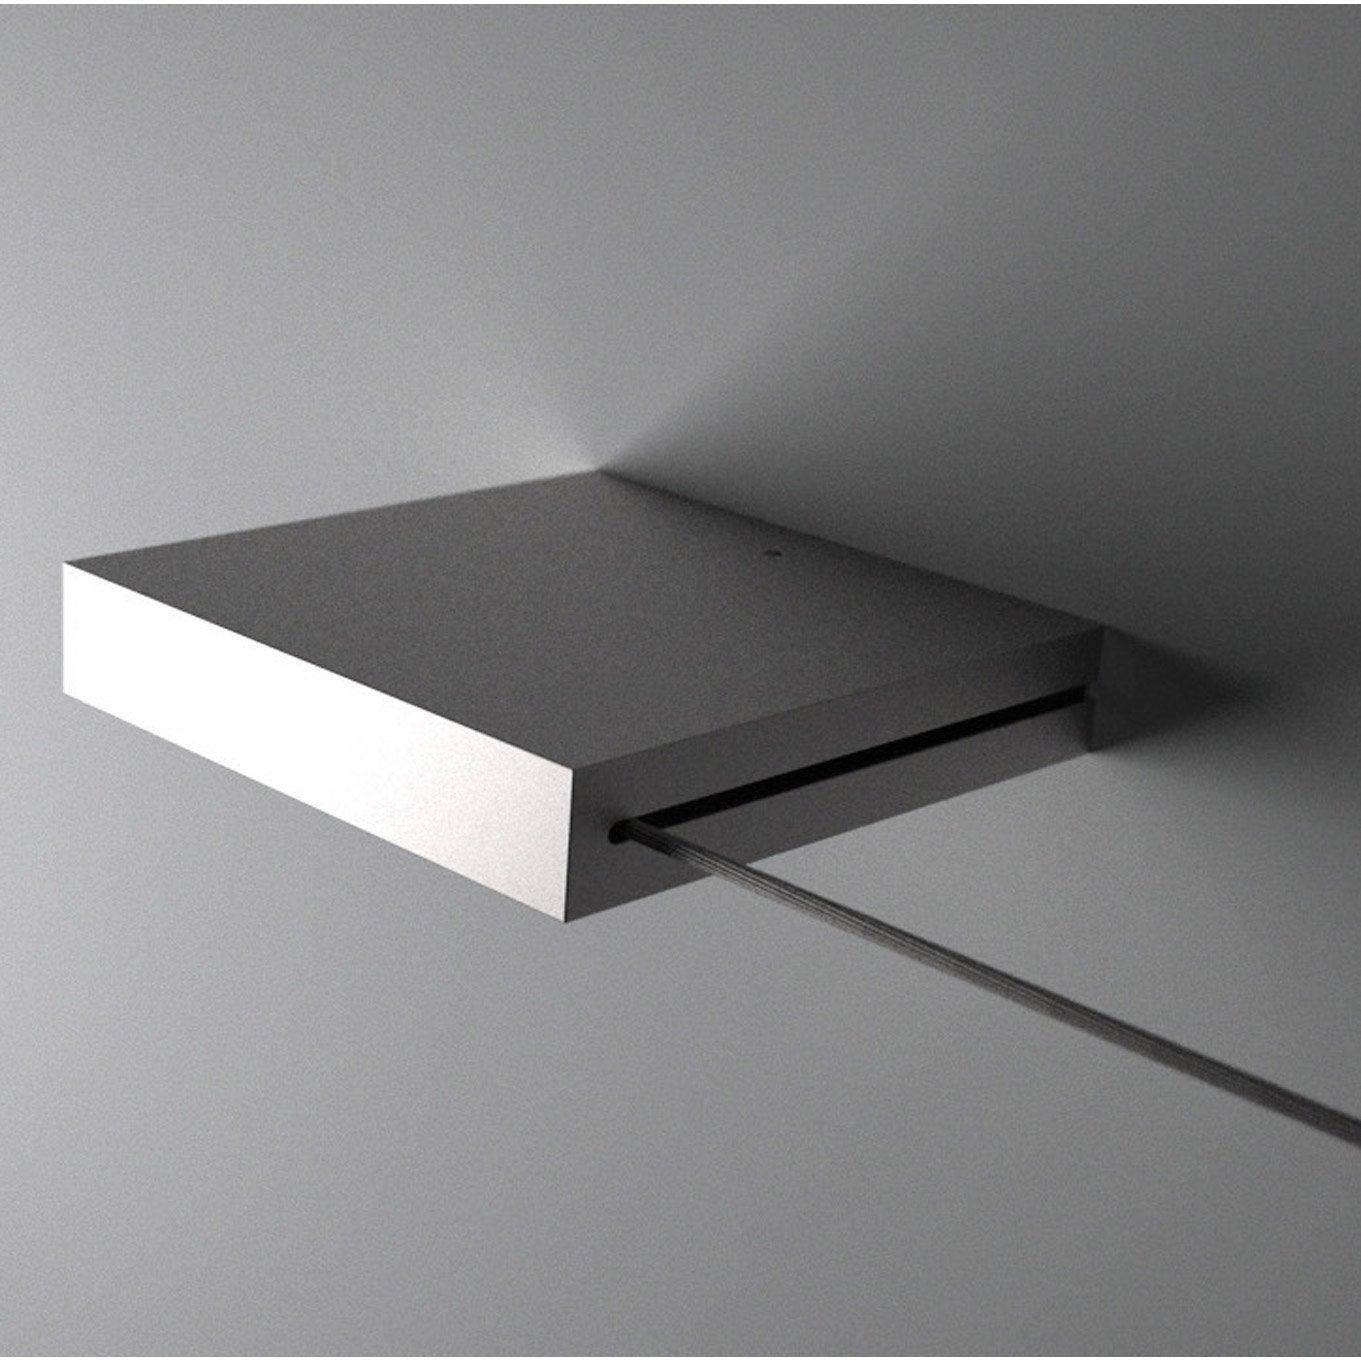 c ble pour mur et plafond universel en kit nickel mat long 5 m leroy merlin. Black Bedroom Furniture Sets. Home Design Ideas